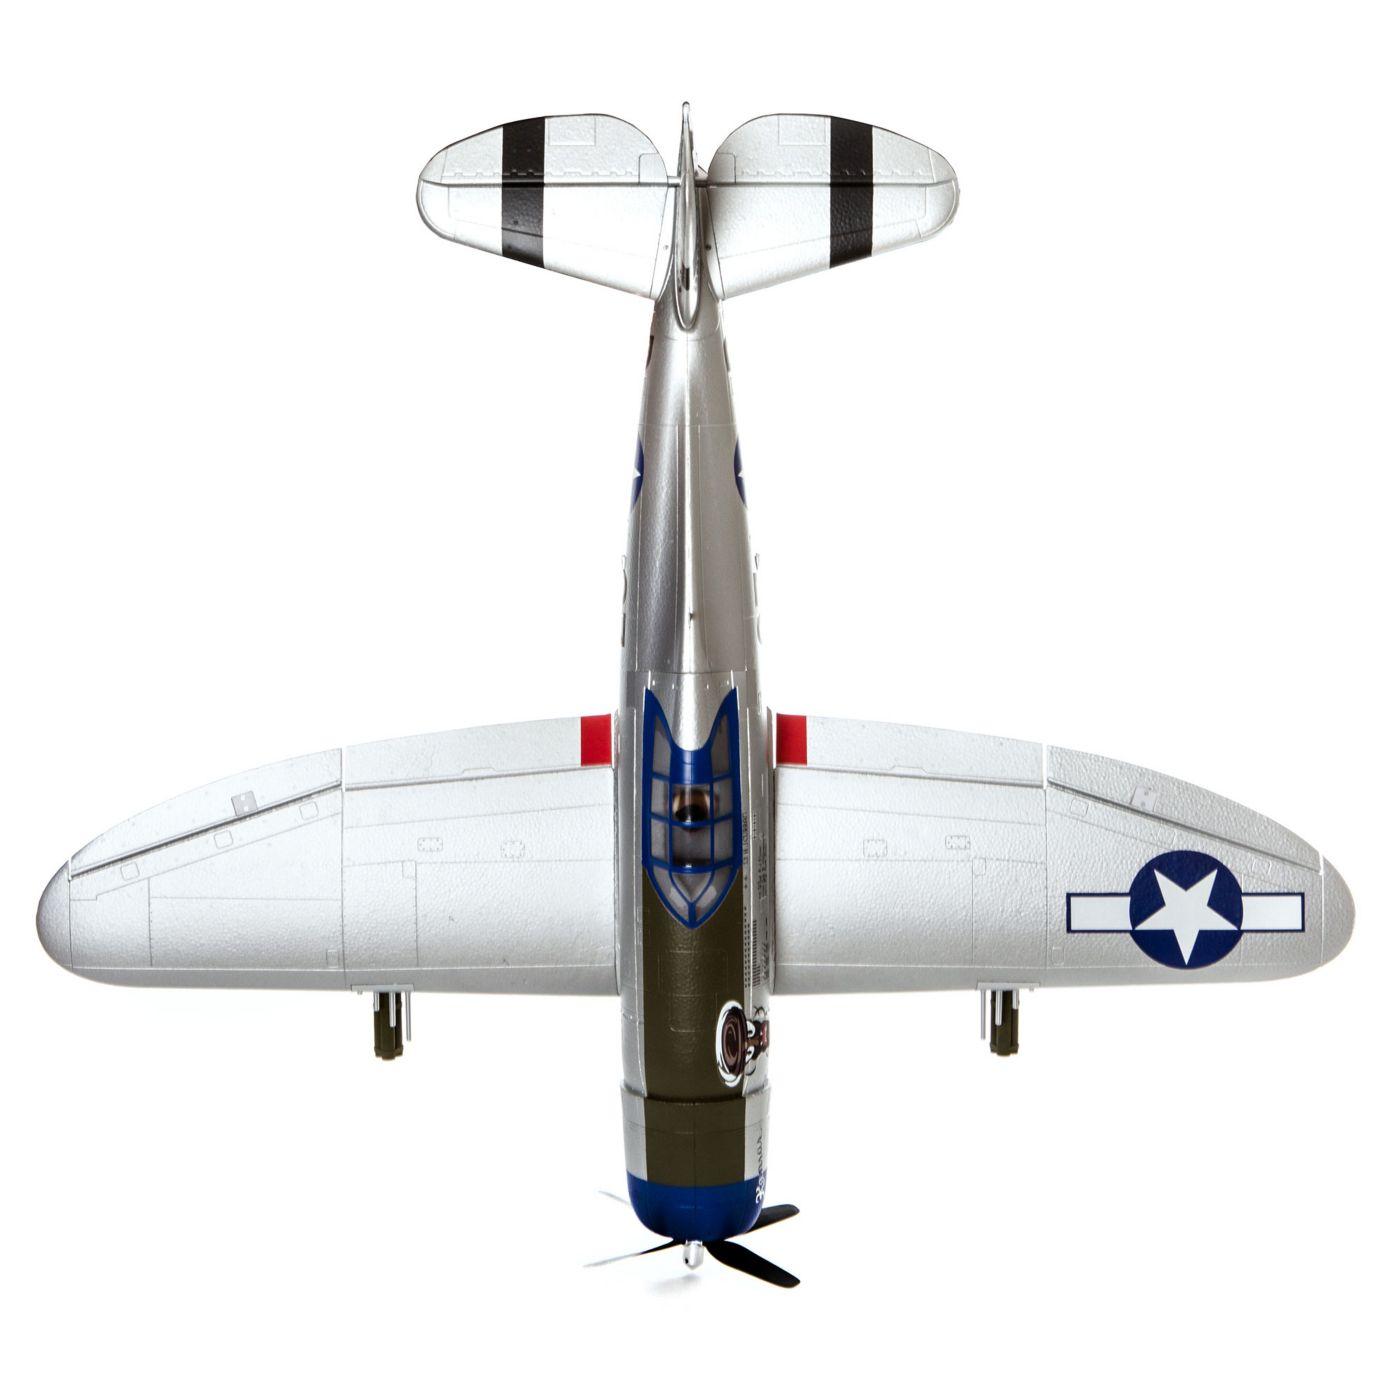 E-flite P-47 Razorback Warbird bnf basic safe 05